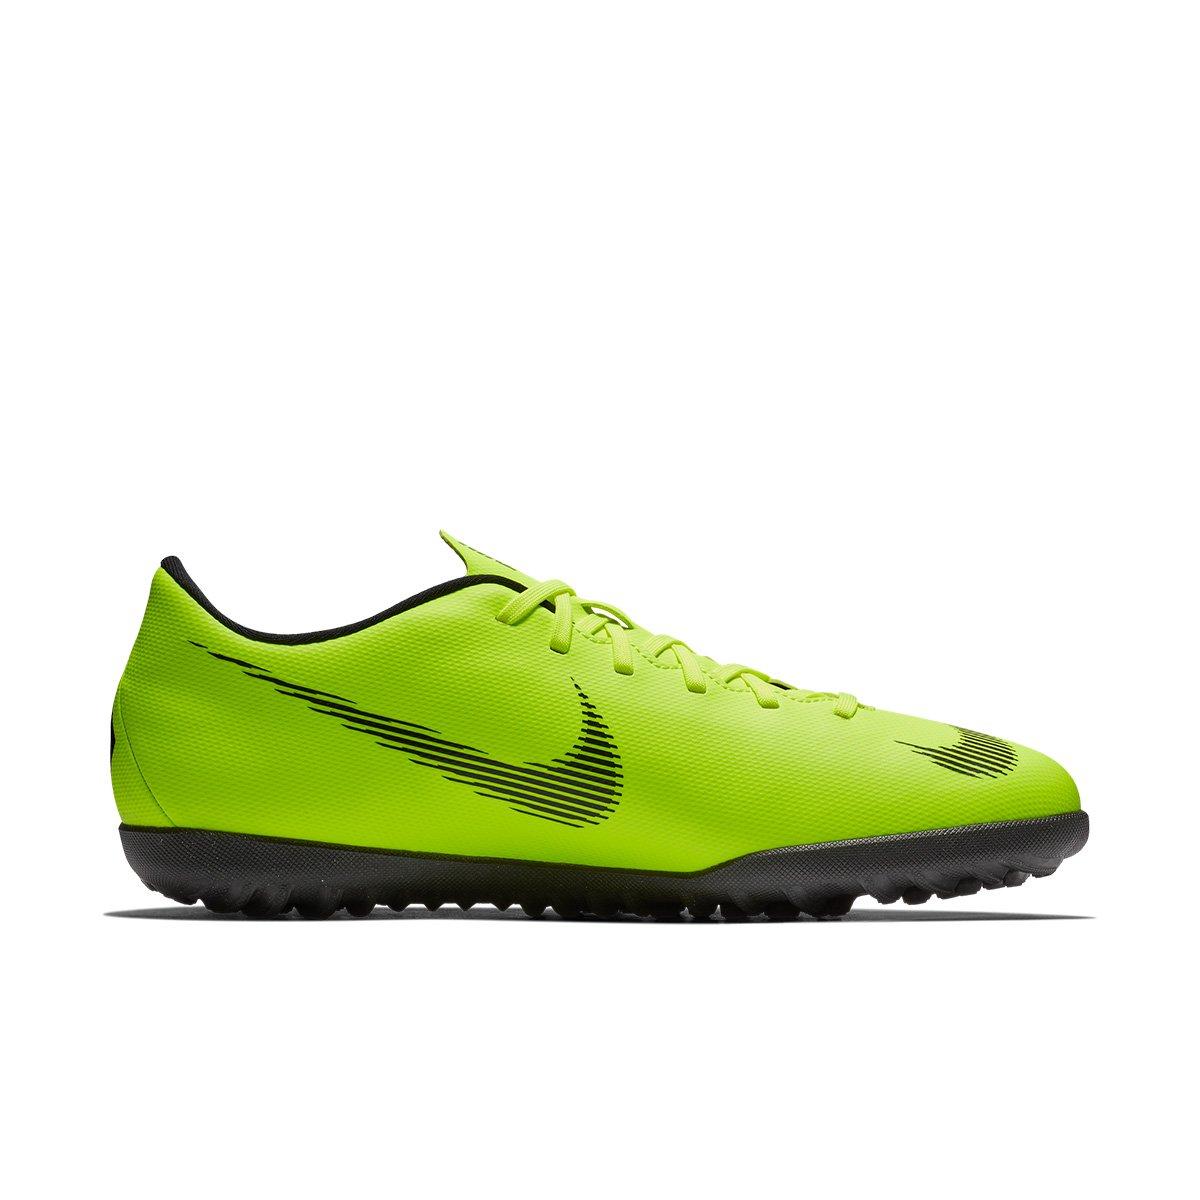 Chuteira Nike Society Mercurial Vapor 12 Club - Dotz  094e2c14093b7